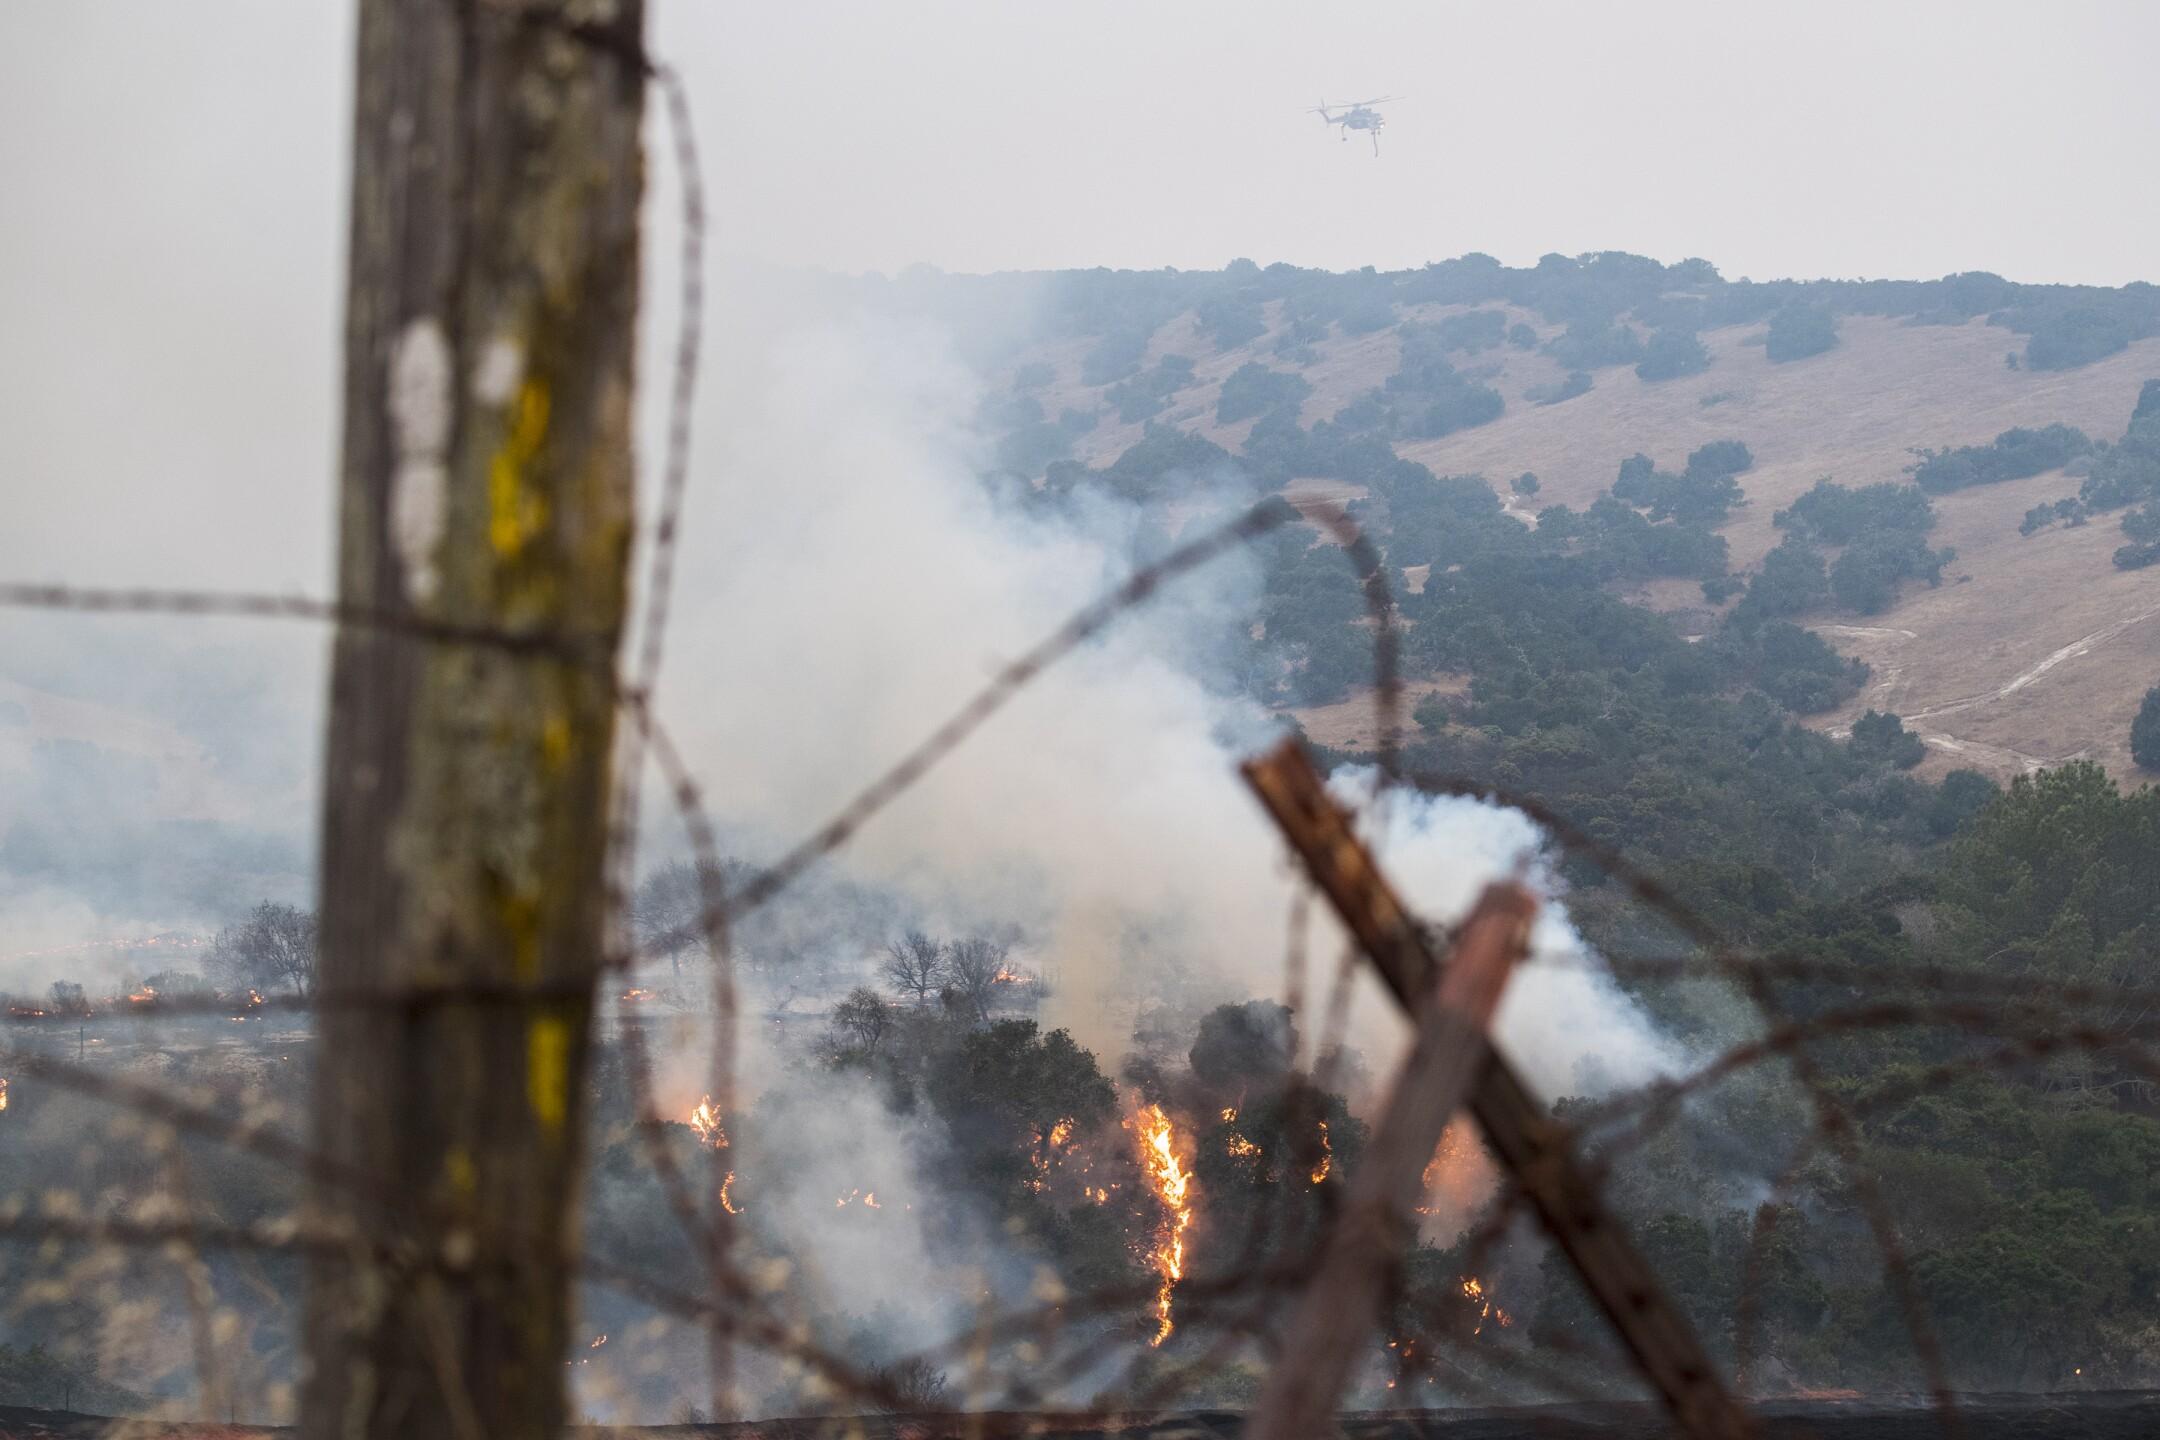 Vacaville Fire